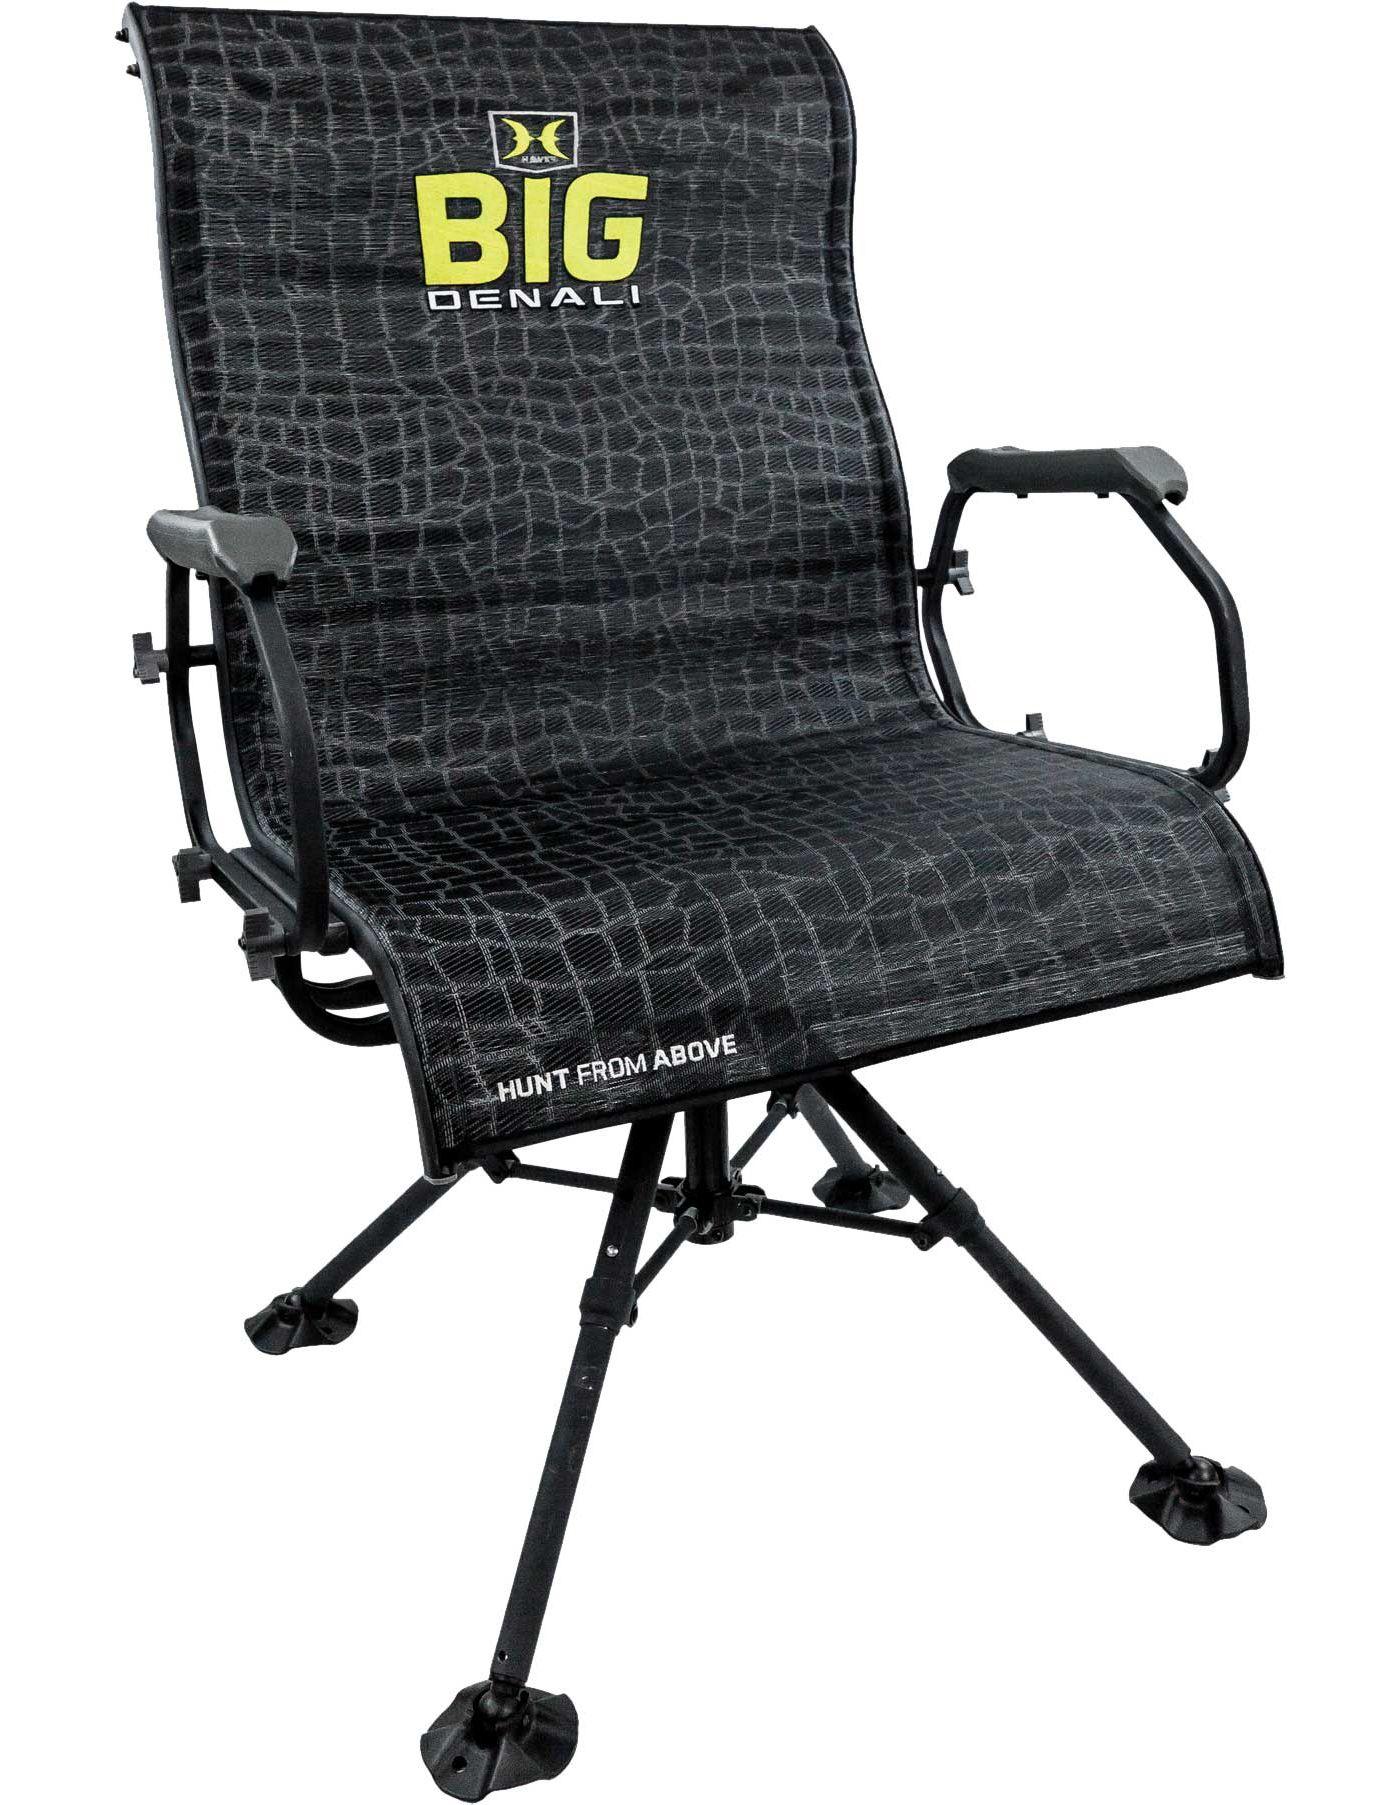 Hawk Hunting Big Denali Blind Chair